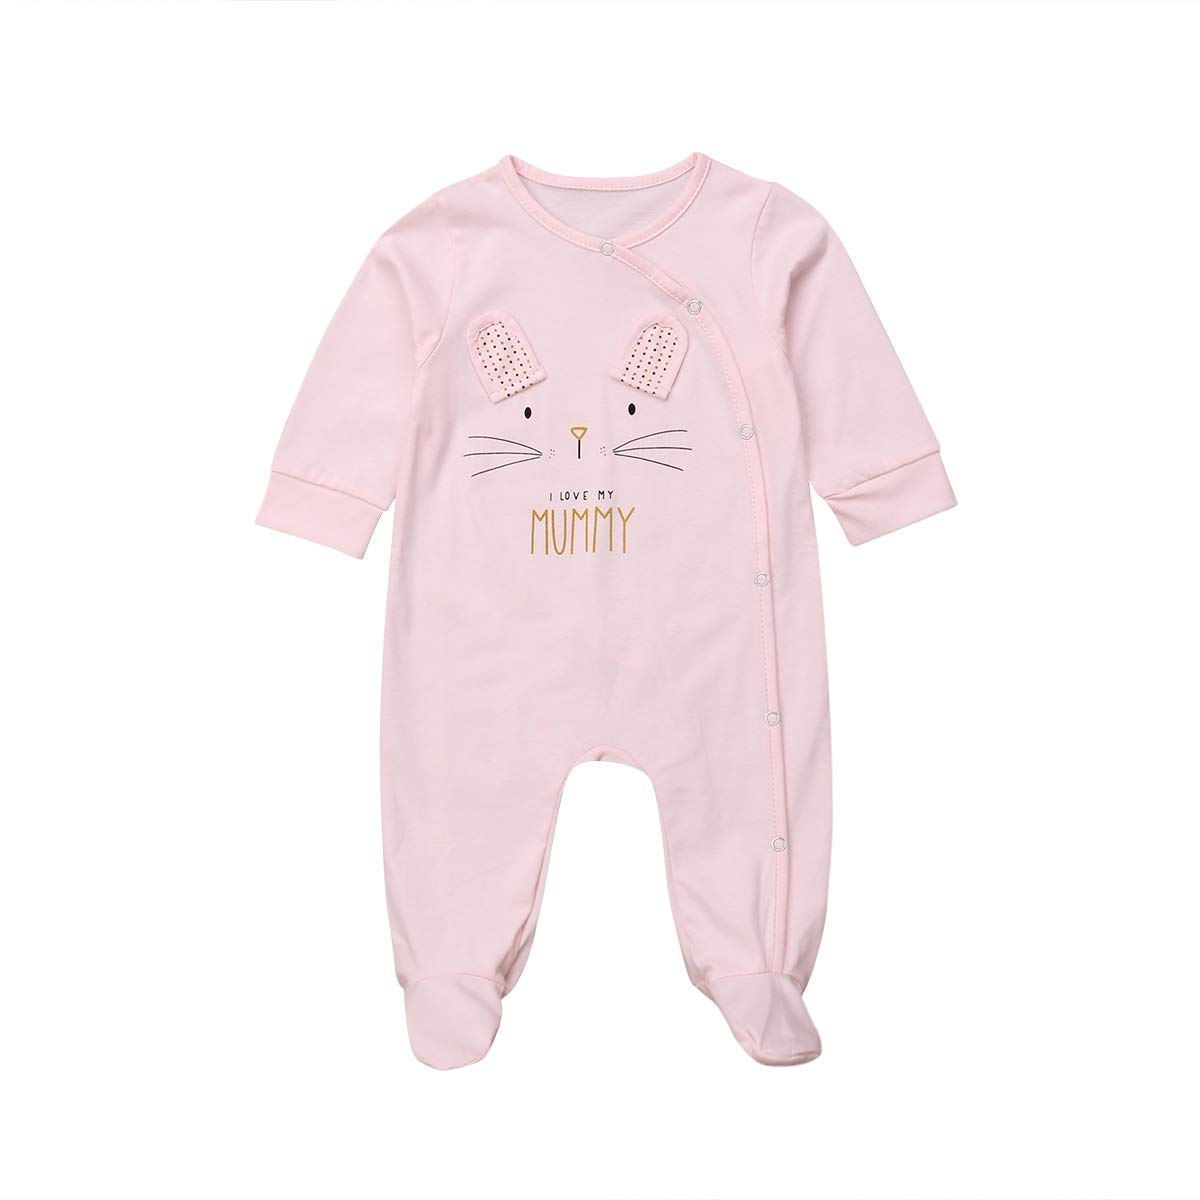 Canrulo Unisex Baby Boys Girls Pajamas Footed Sleeper PJs Long Sleeve Jumpsuit Romper